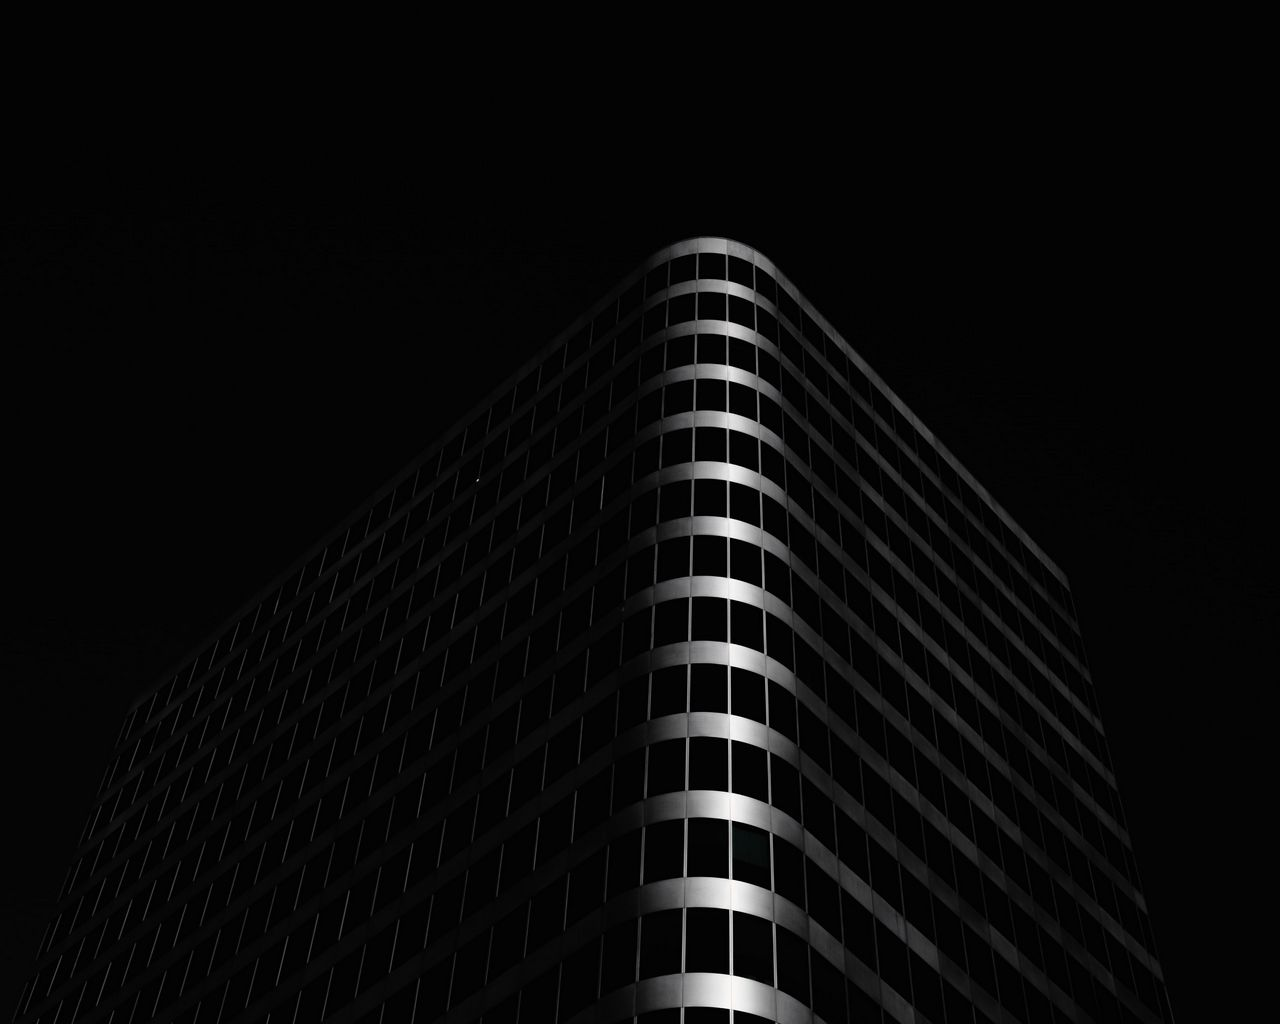 1280x1024 Wallpaper building, architecture, black, dark